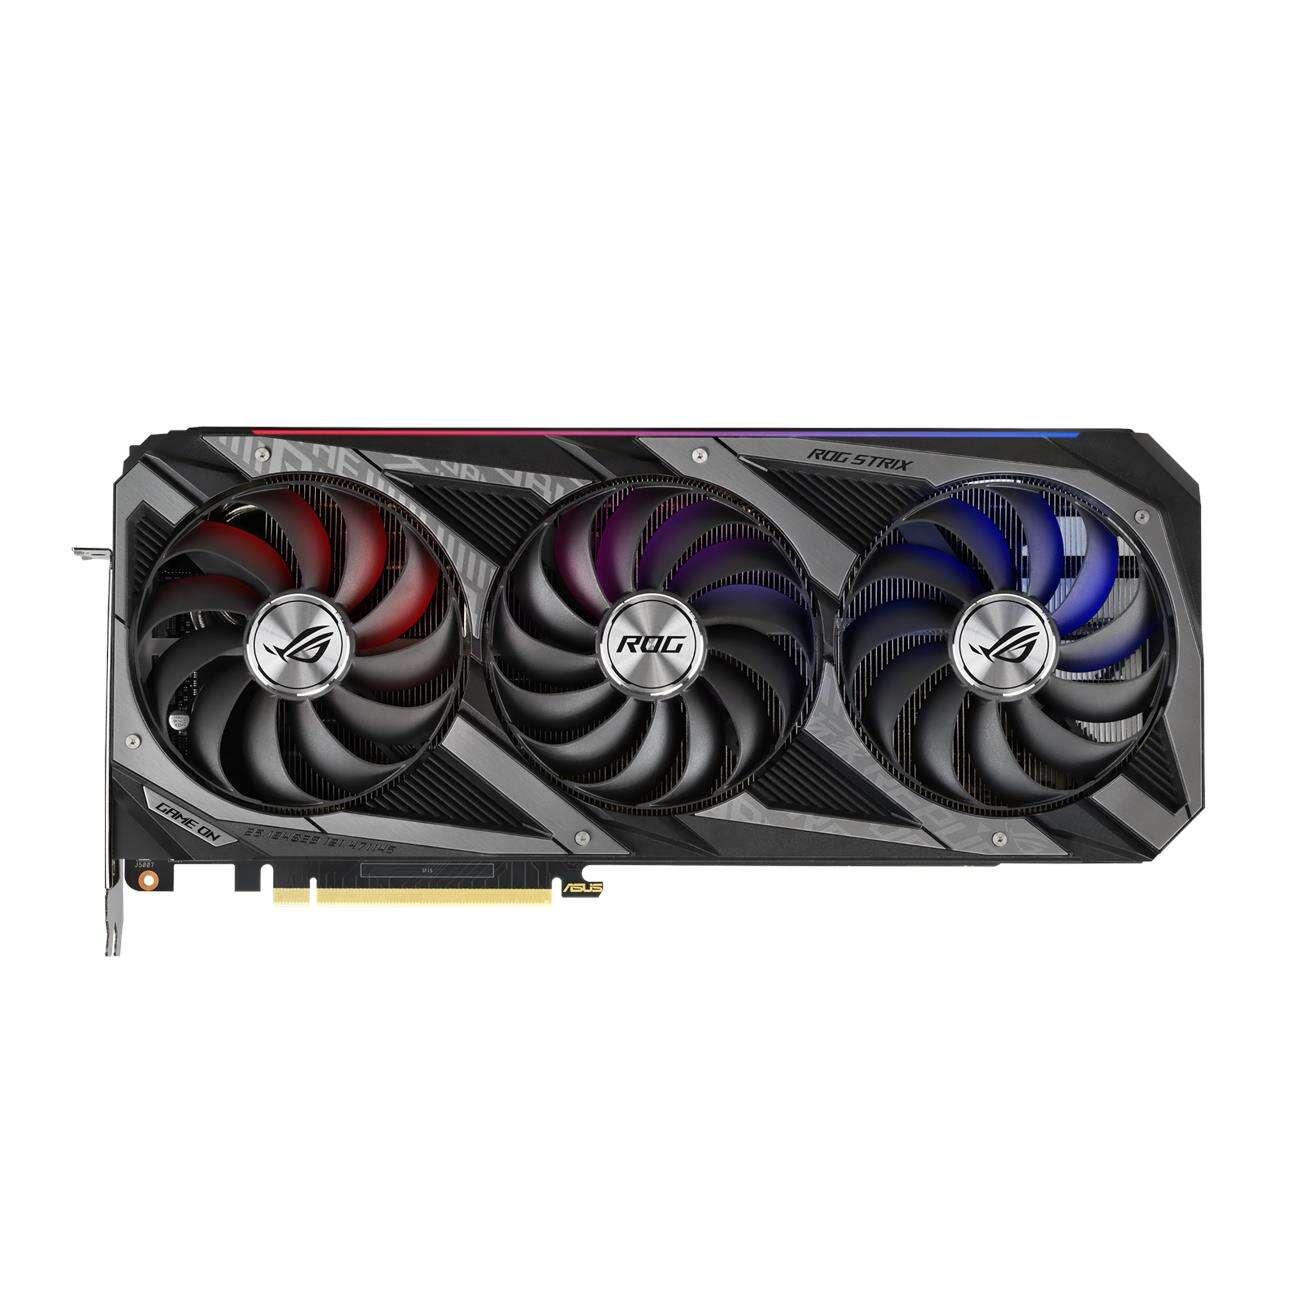 test Asus GeForce RTX 3090 ROG Strix OC, recenzja Asus GeForce RTX 3090 ROG Strix OC, opinia Asus GeForce RTX 3090 ROG Strix OC